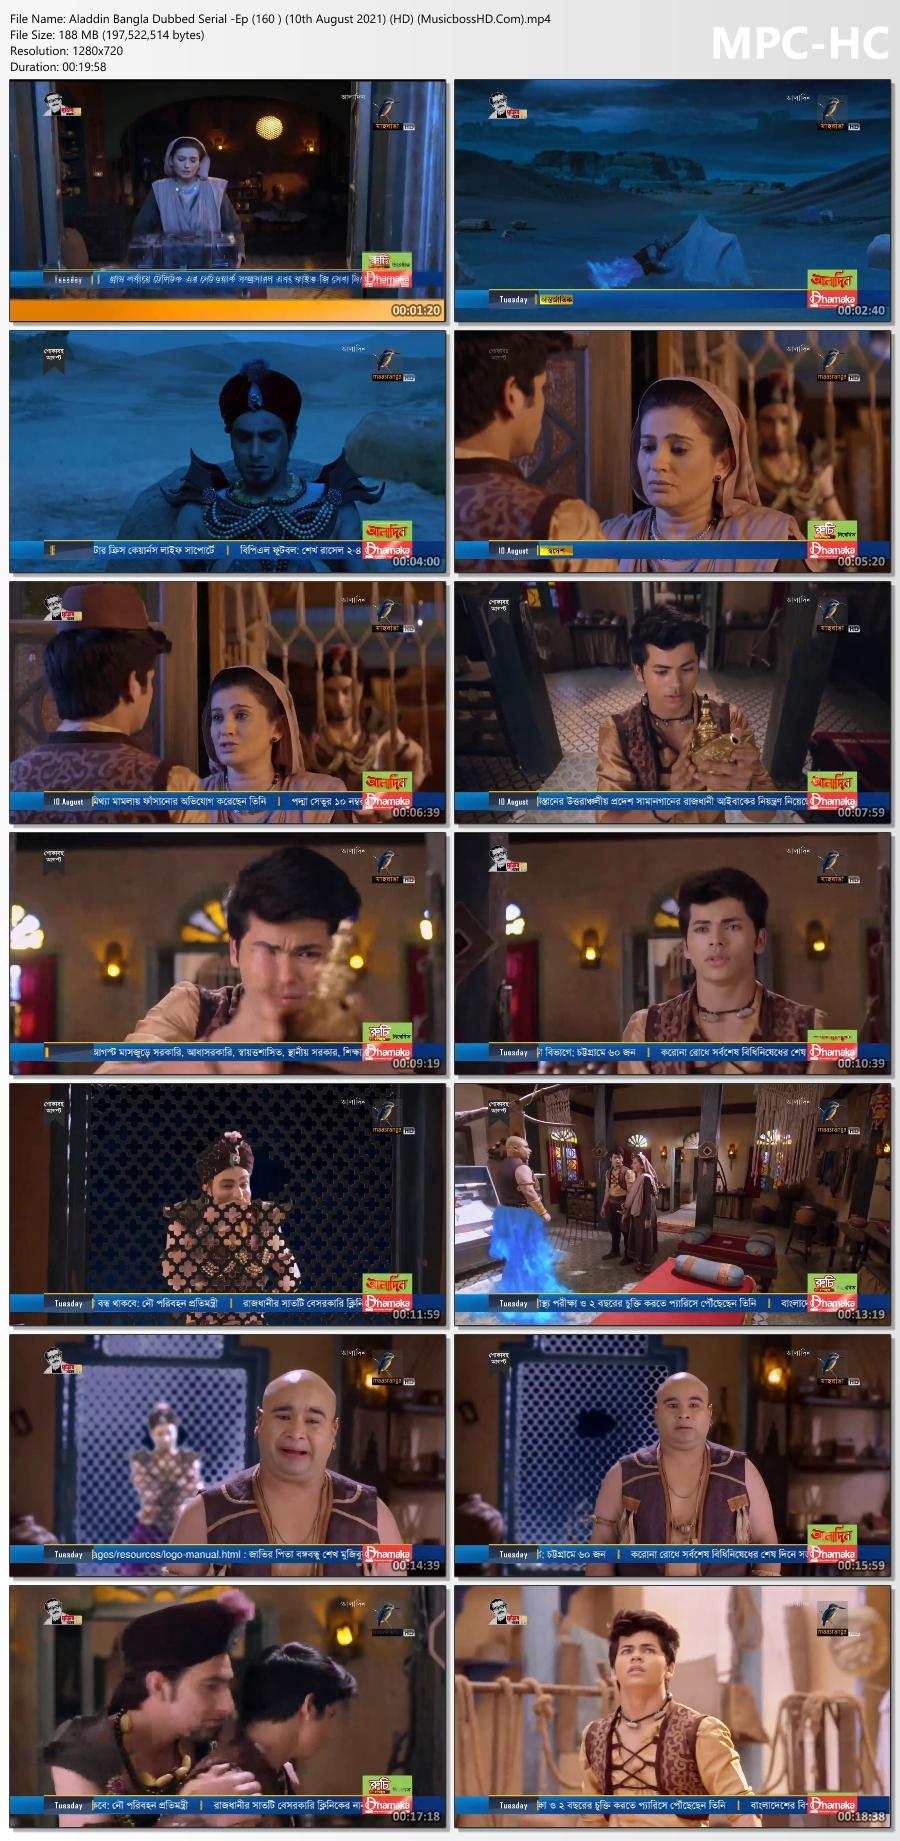 Aladdin-Bangla-Dubbed-Serial-Ep-160-10th-August-2021-HD-Musicboss-HD-Com-mp4-thumbs